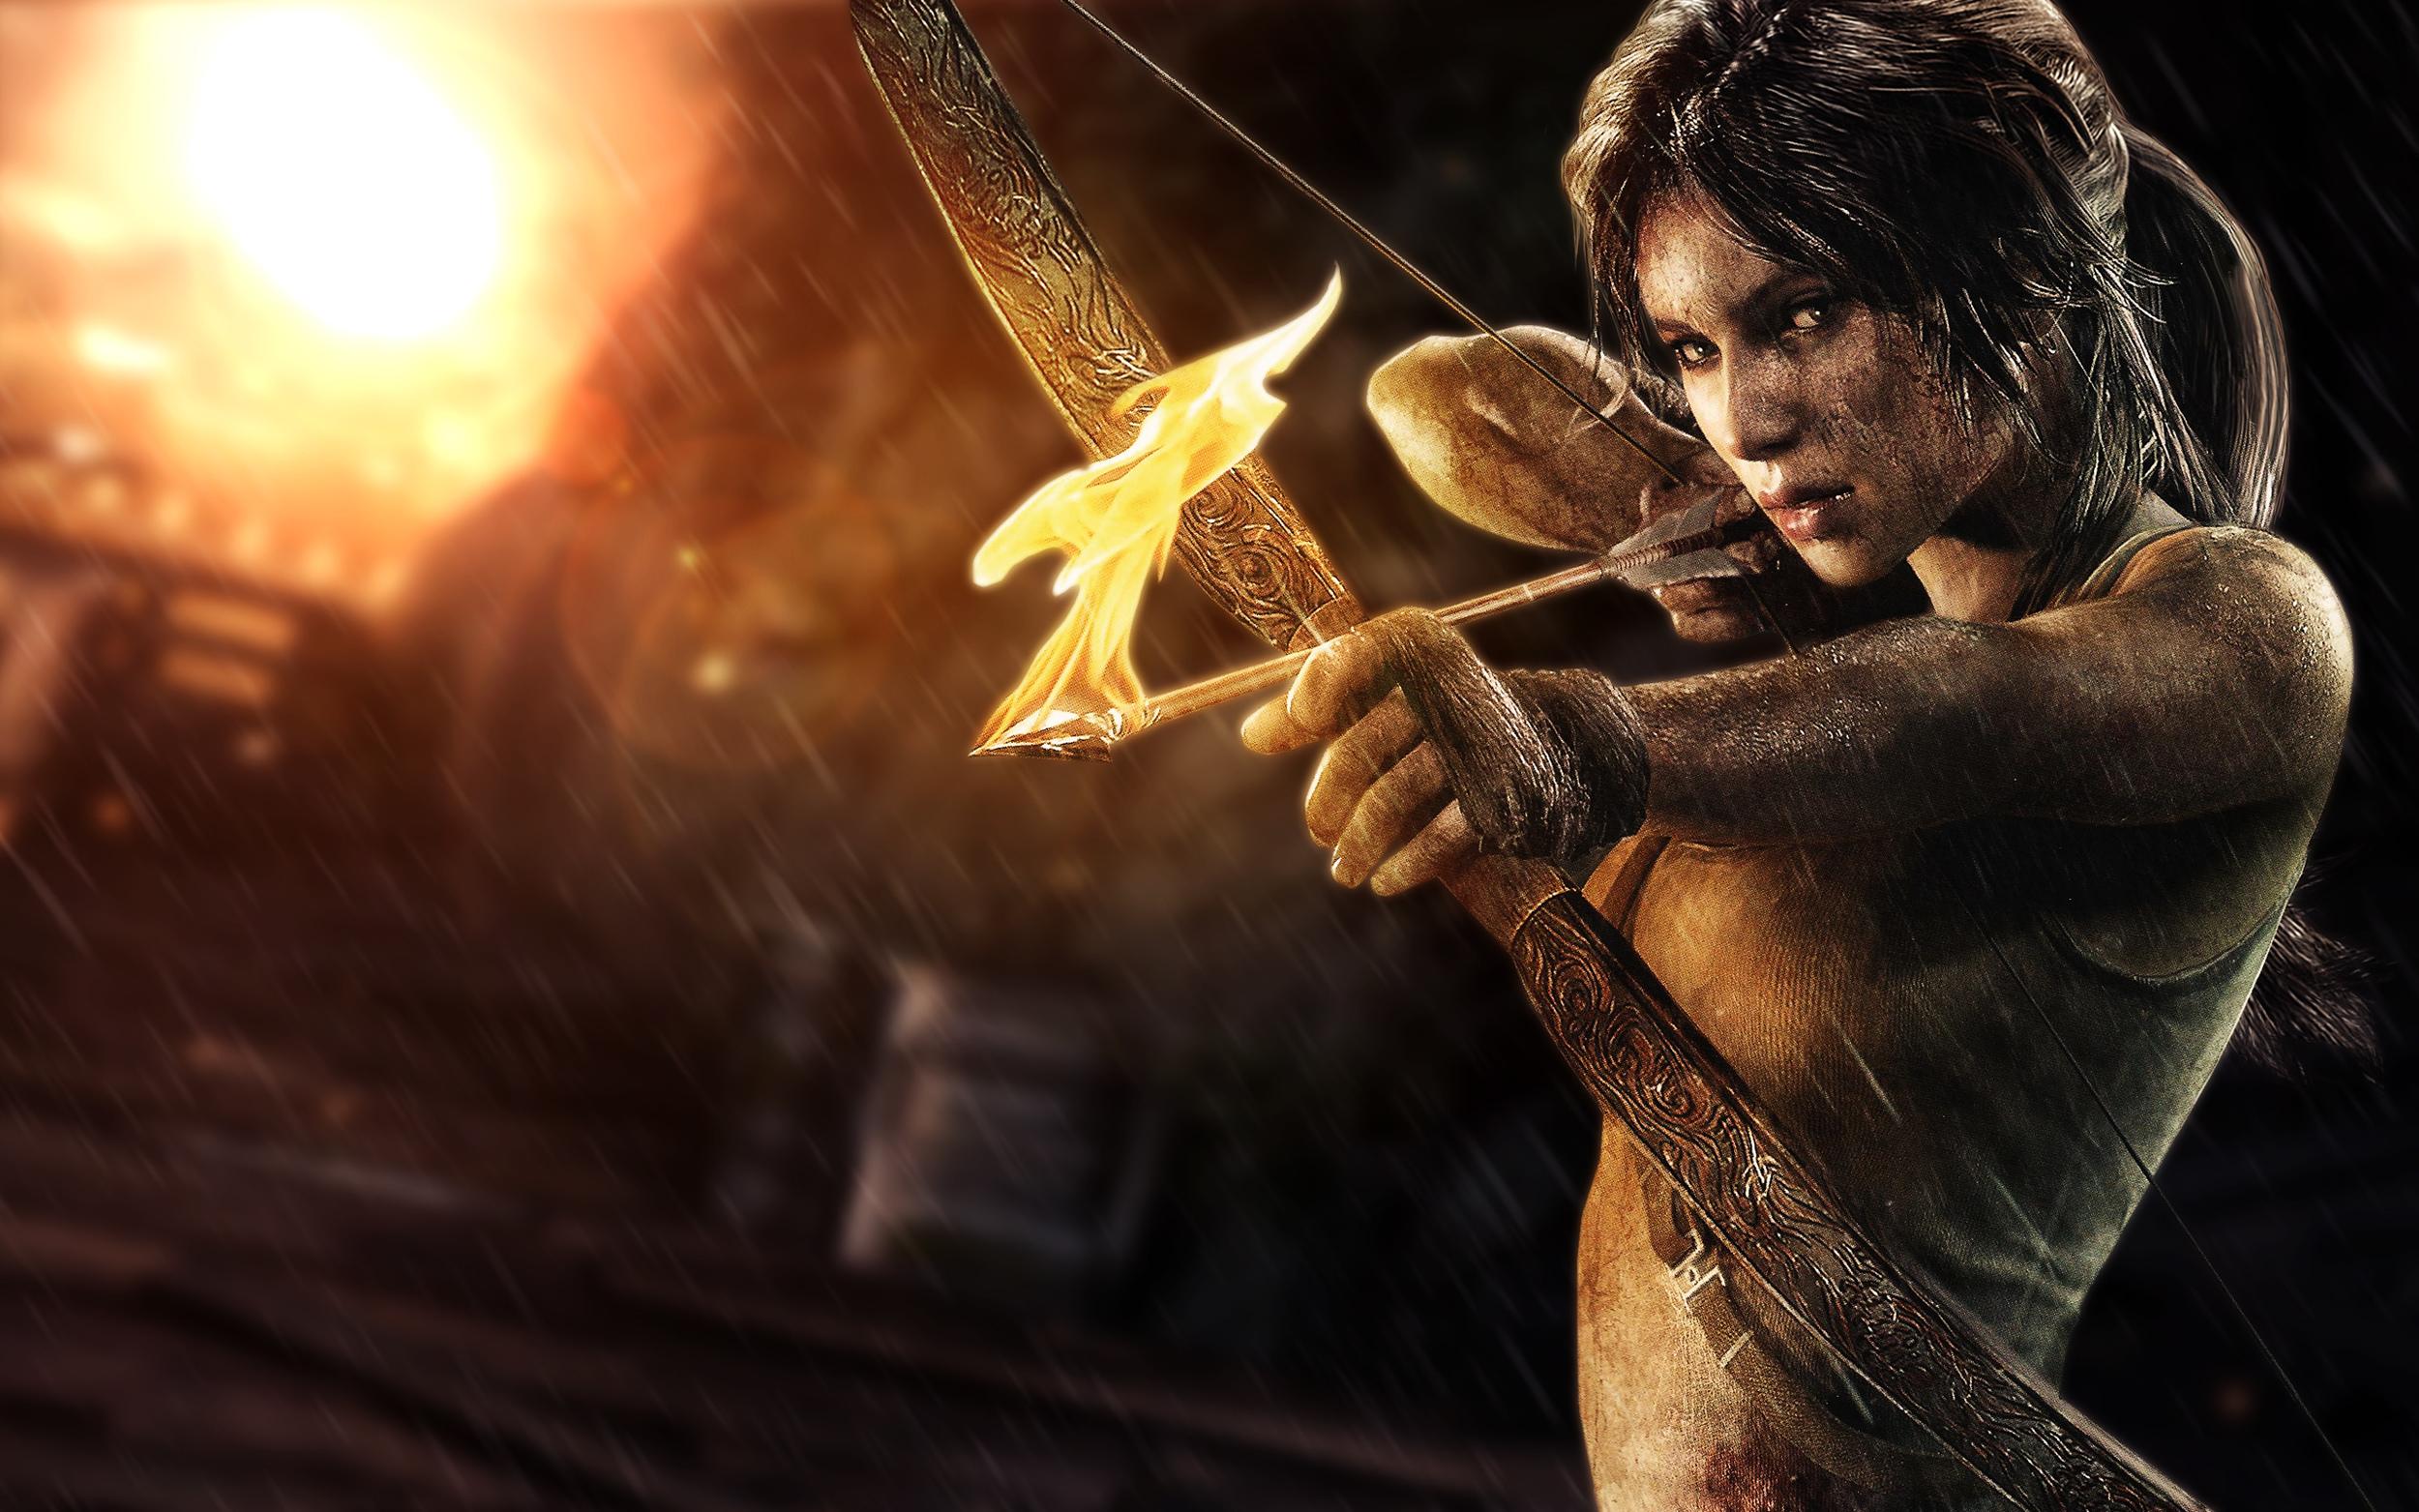 Tomb-Raider-2013-4